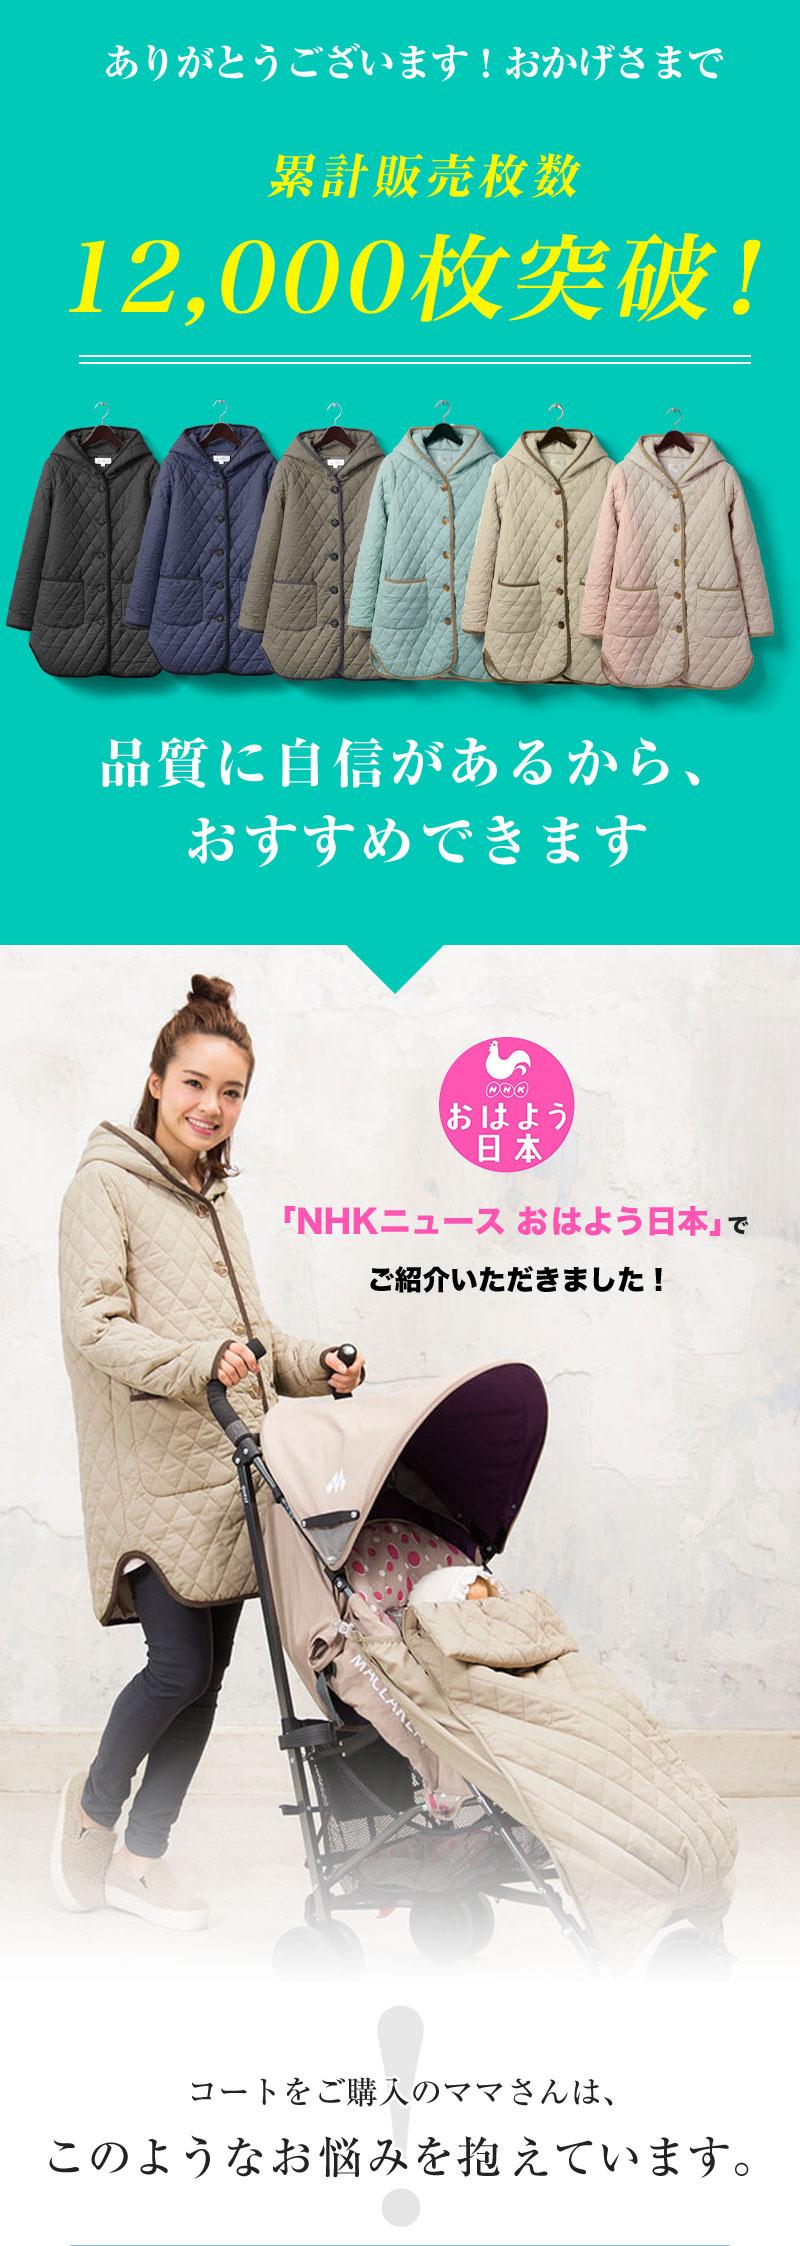 NHK おはよう日本で紹介 ママの悩みを解決